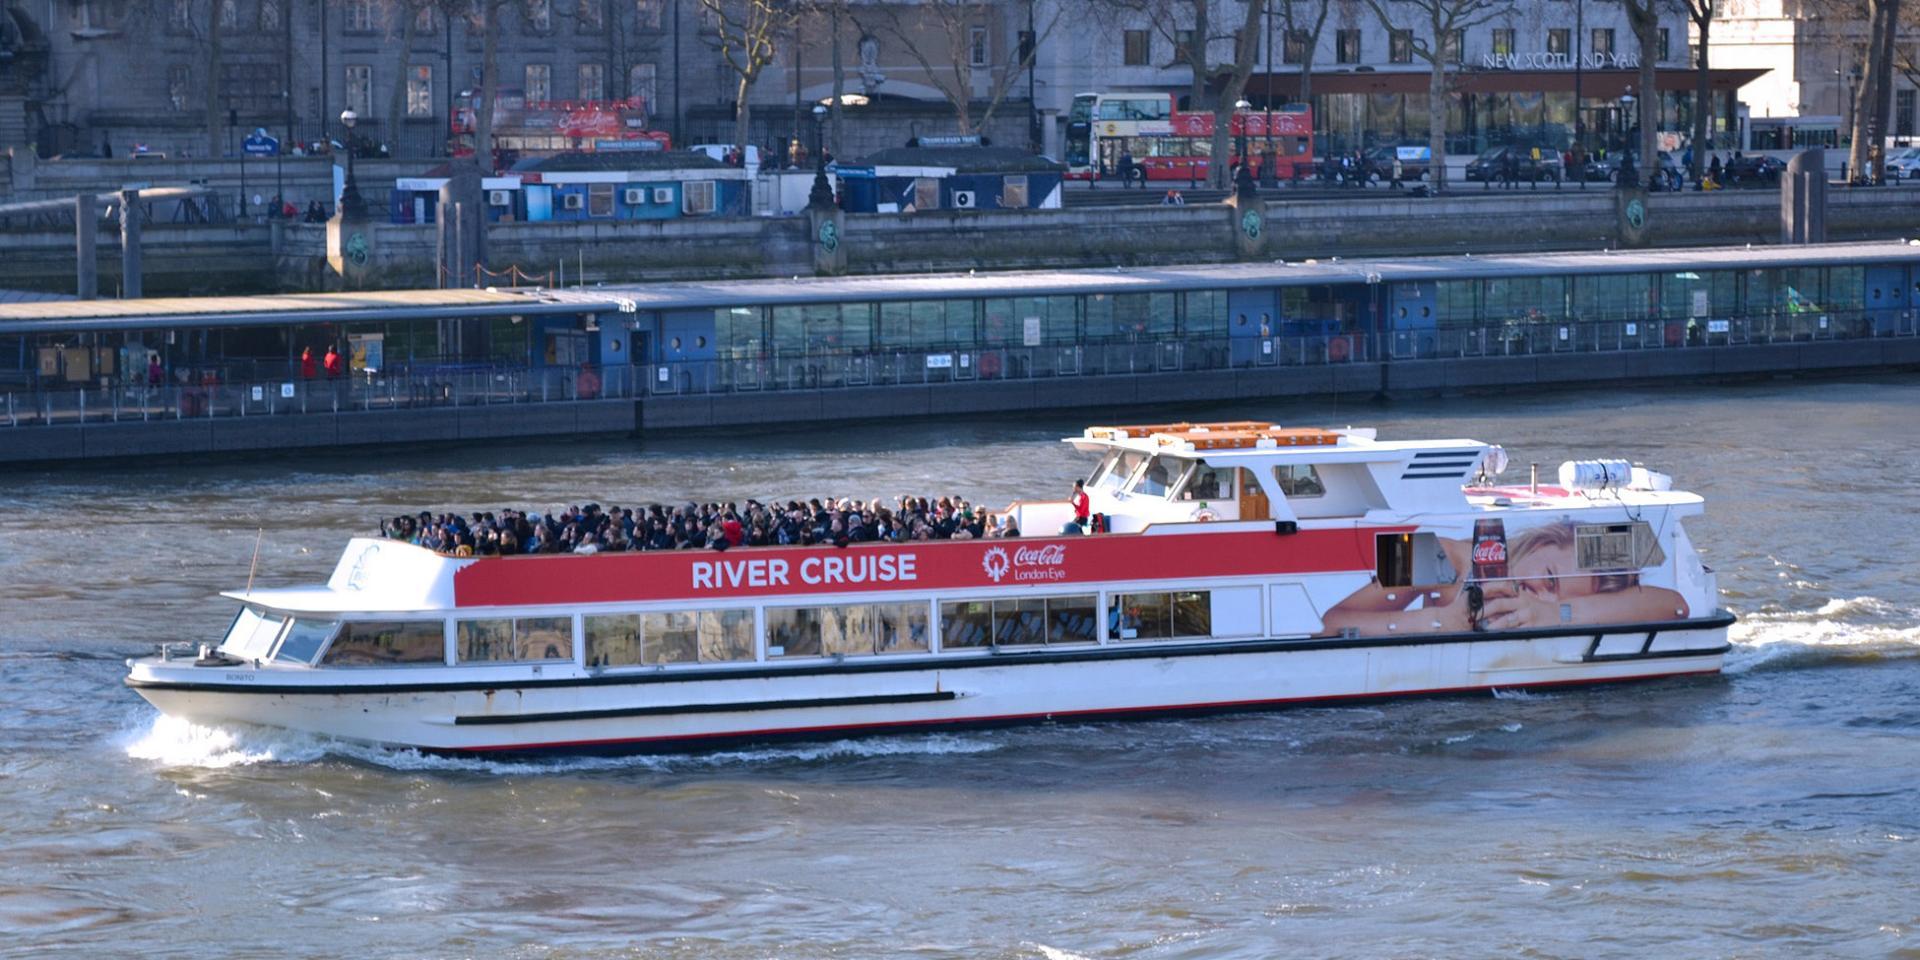 Thames River Cruise London Eye